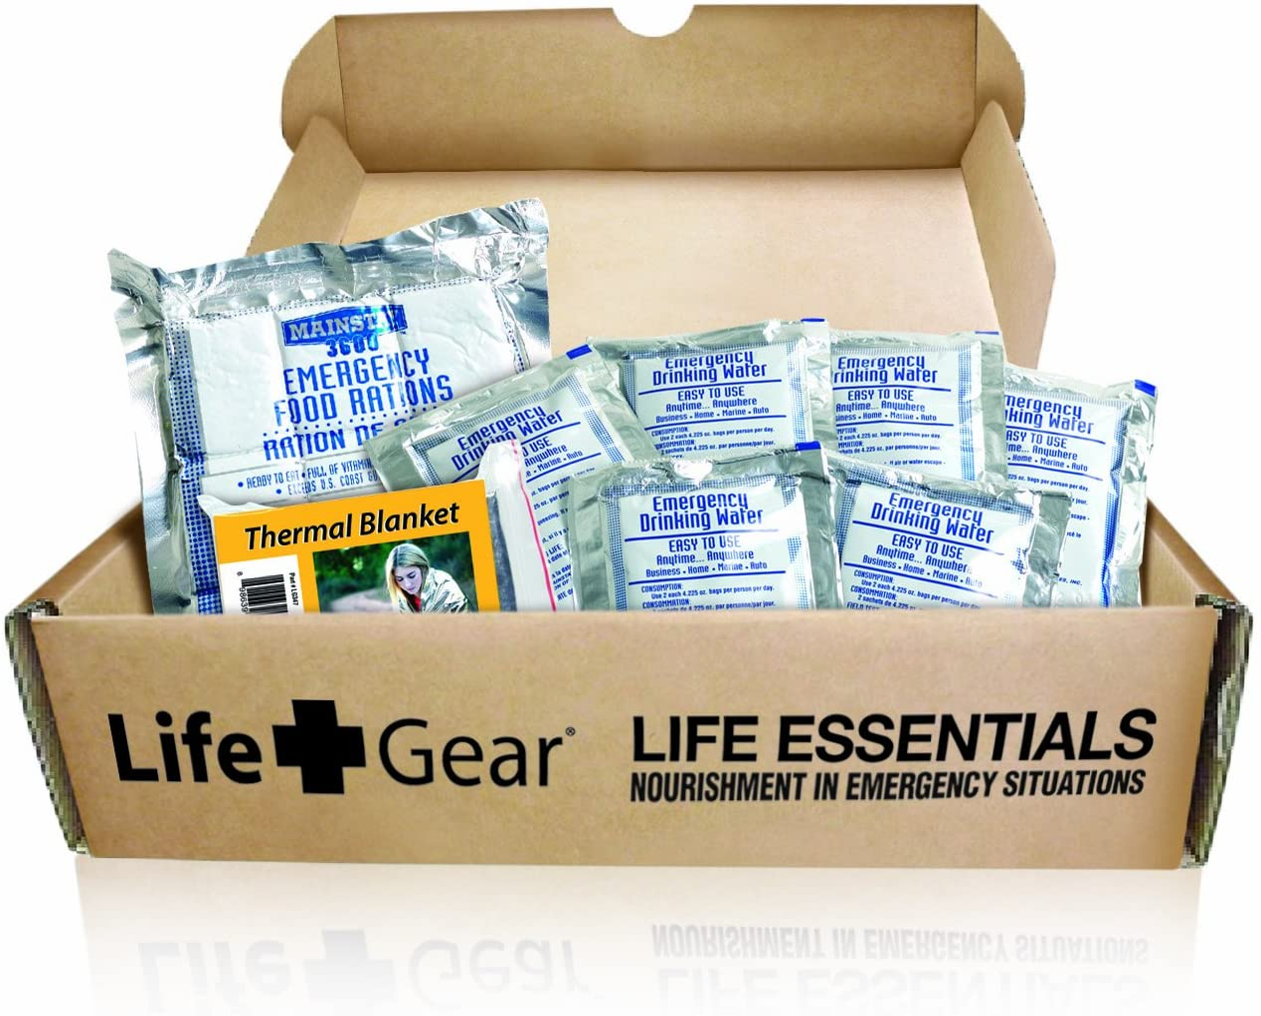 Life Gear - LG329 Emergency Food blanket 1 Ranking TOP3 2021 model Thermal Water for